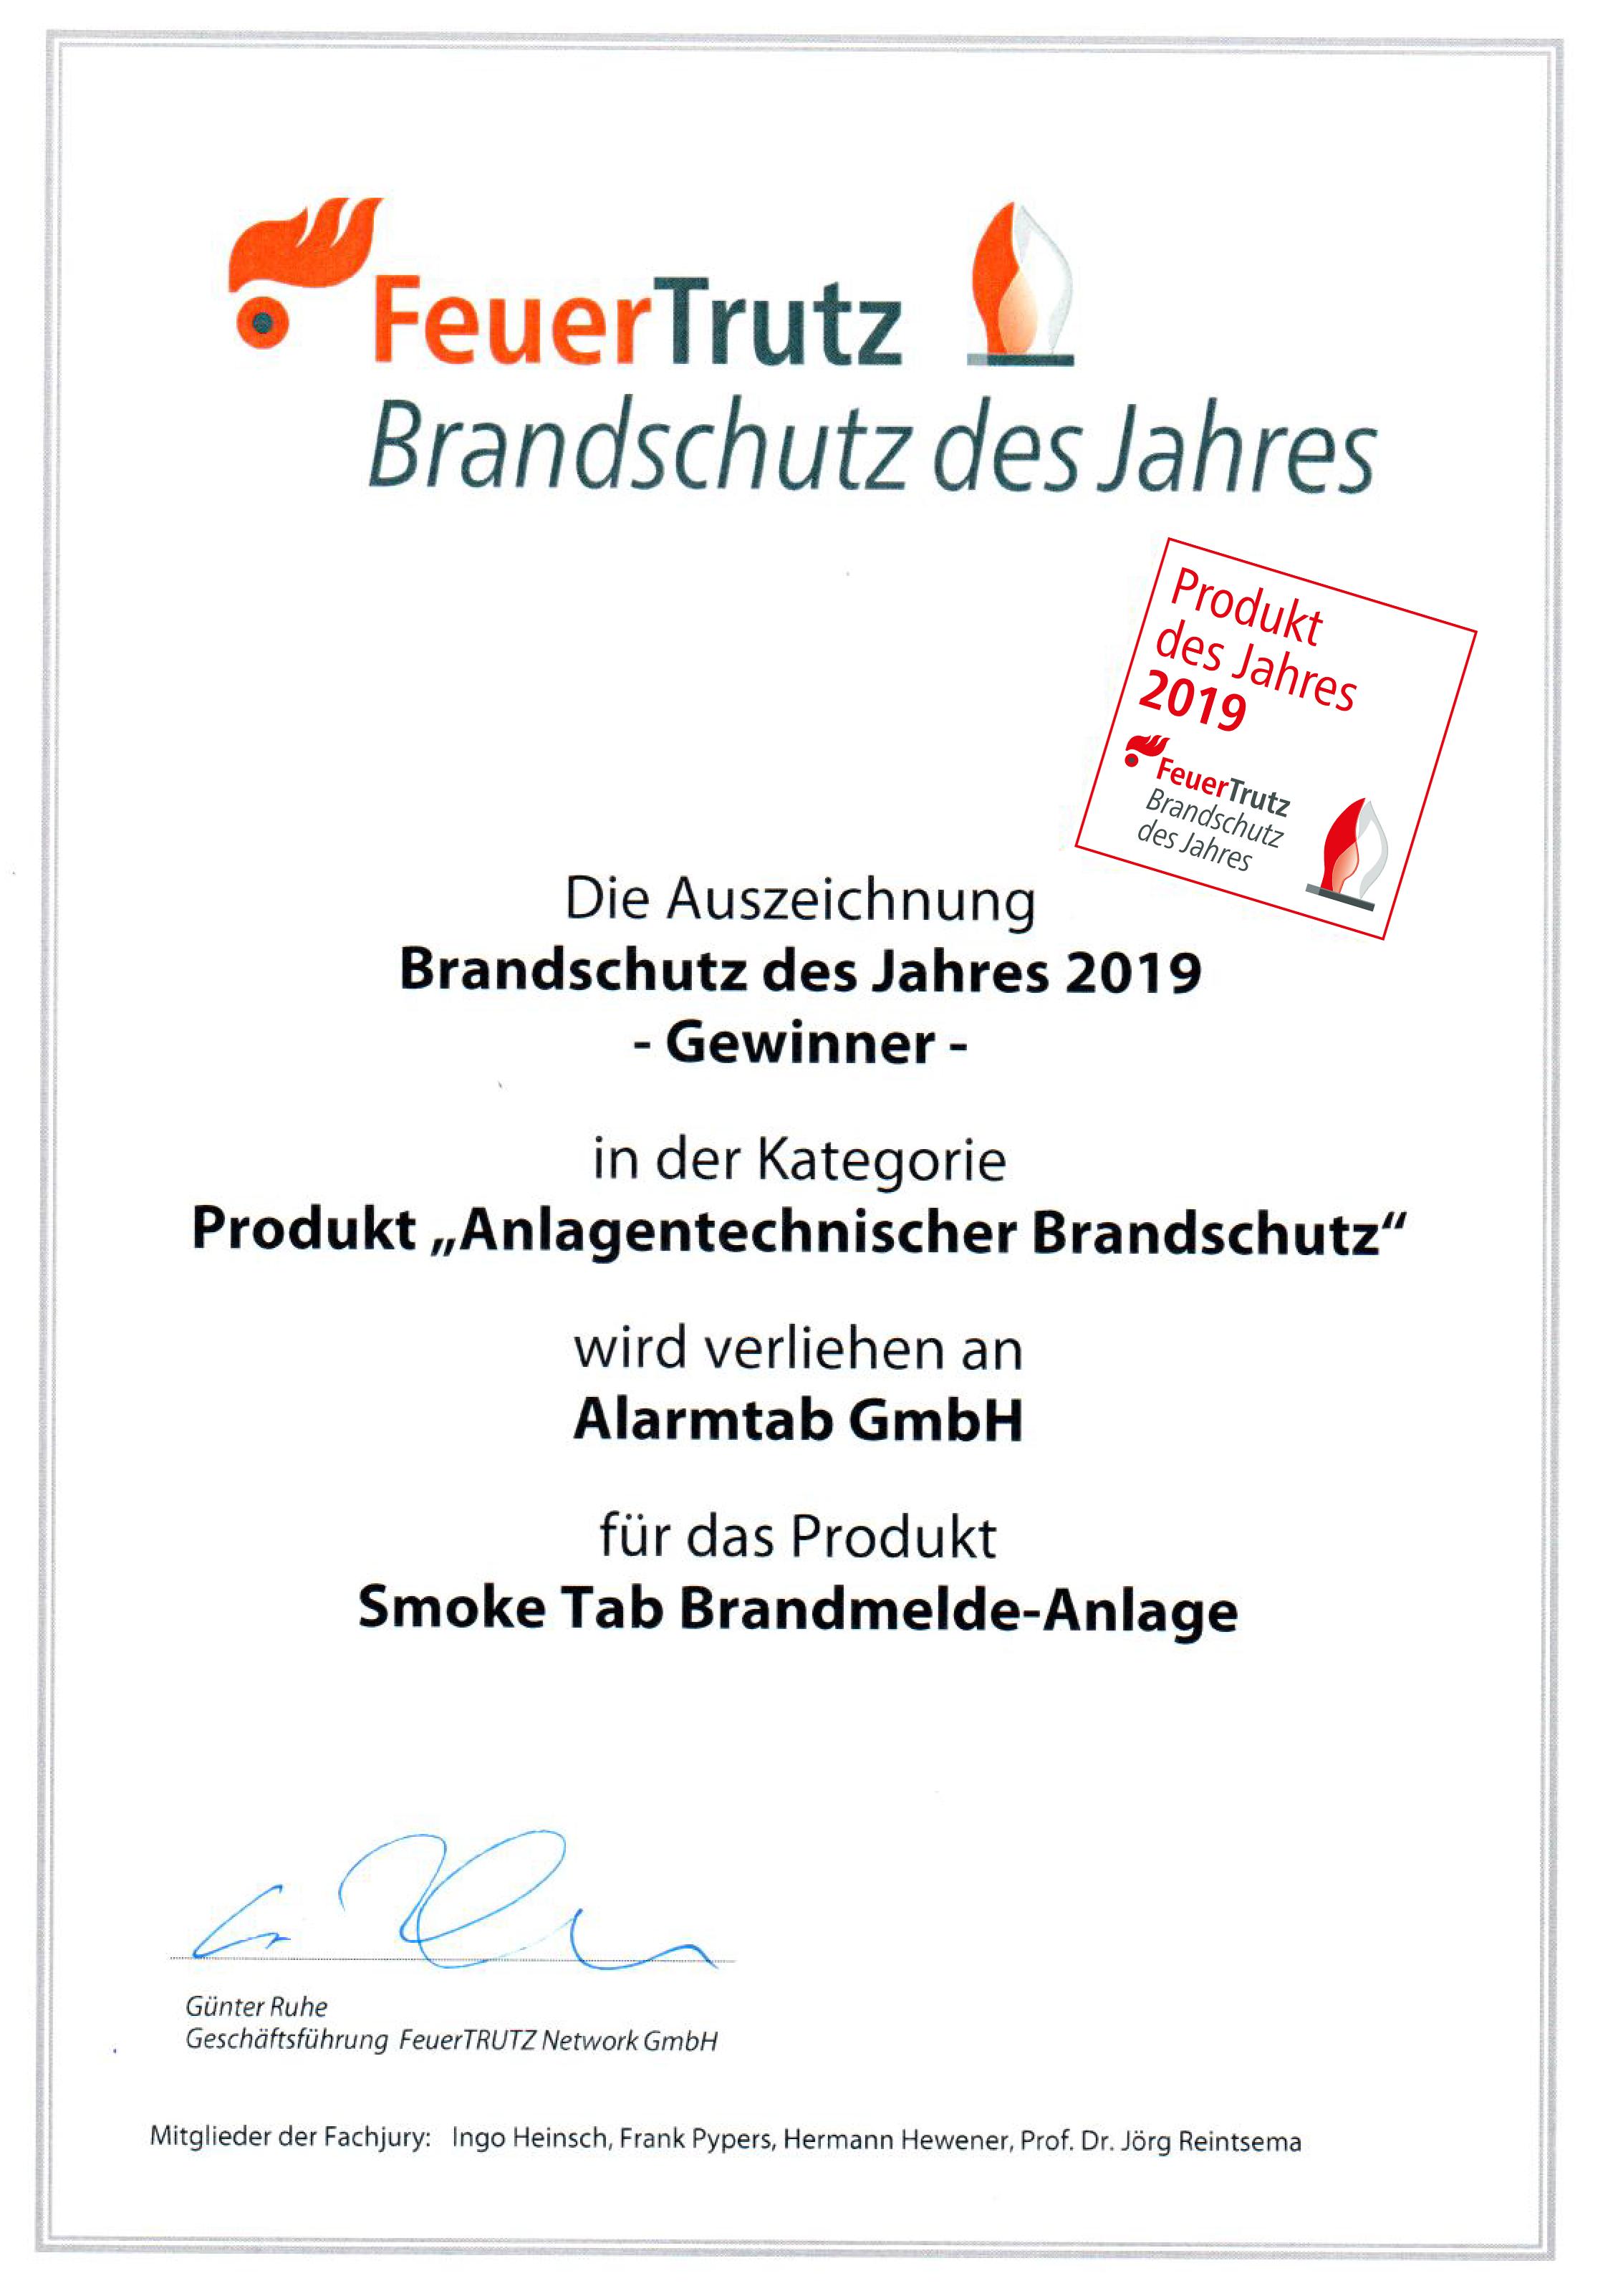 Feuertrutz_Urkunde_SmokeTab